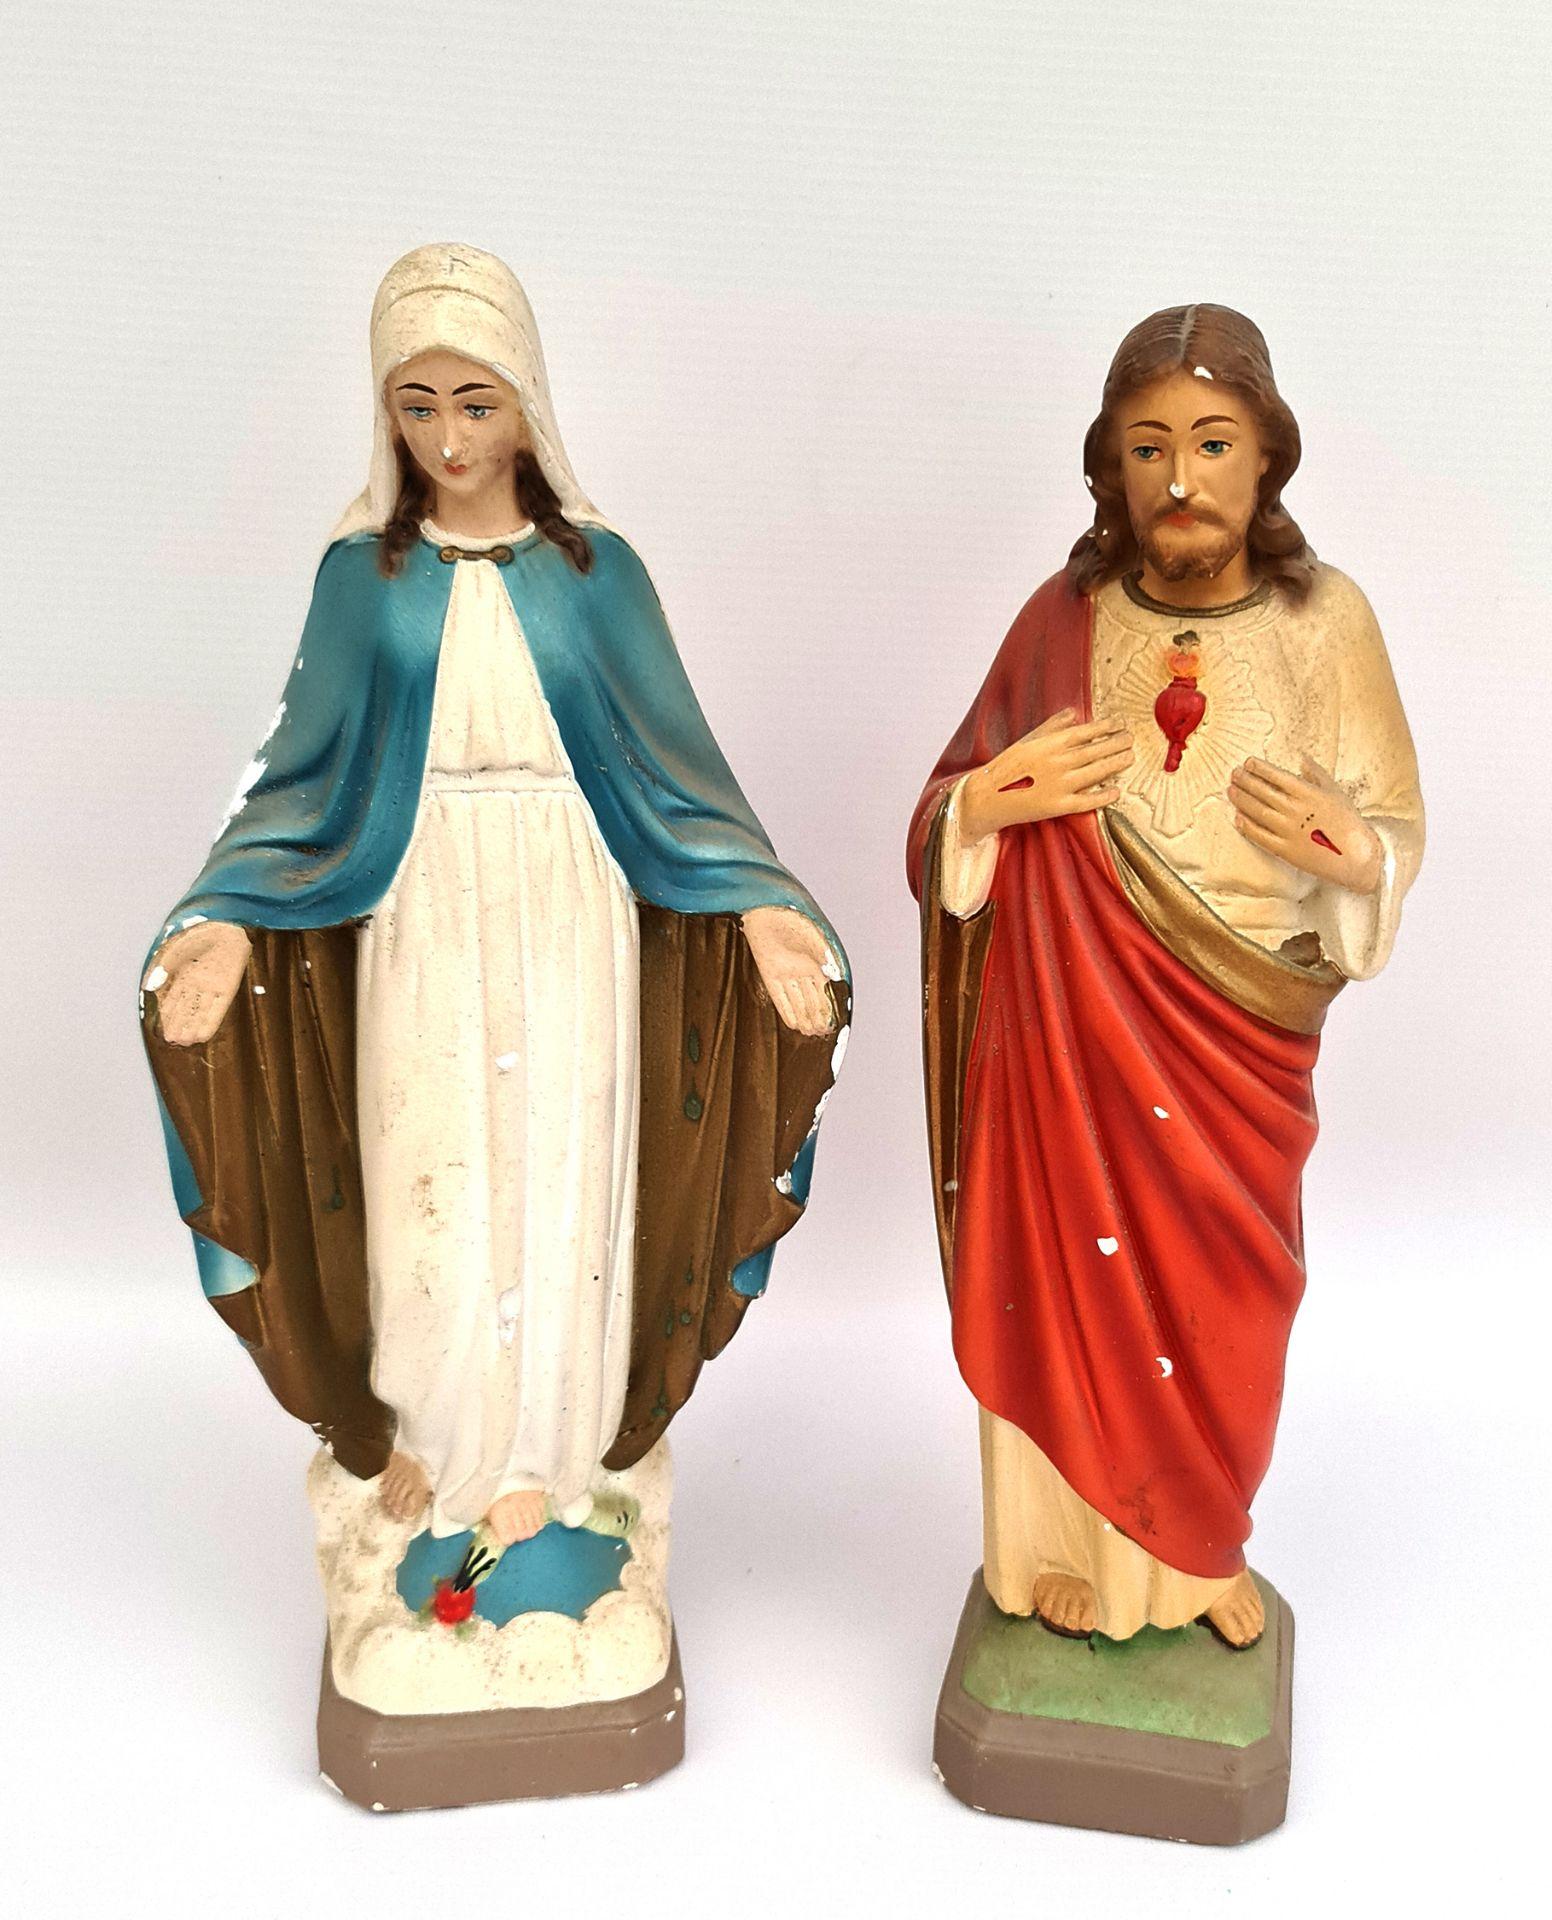 Vintage Mary & Joseph Religious Plater Figures